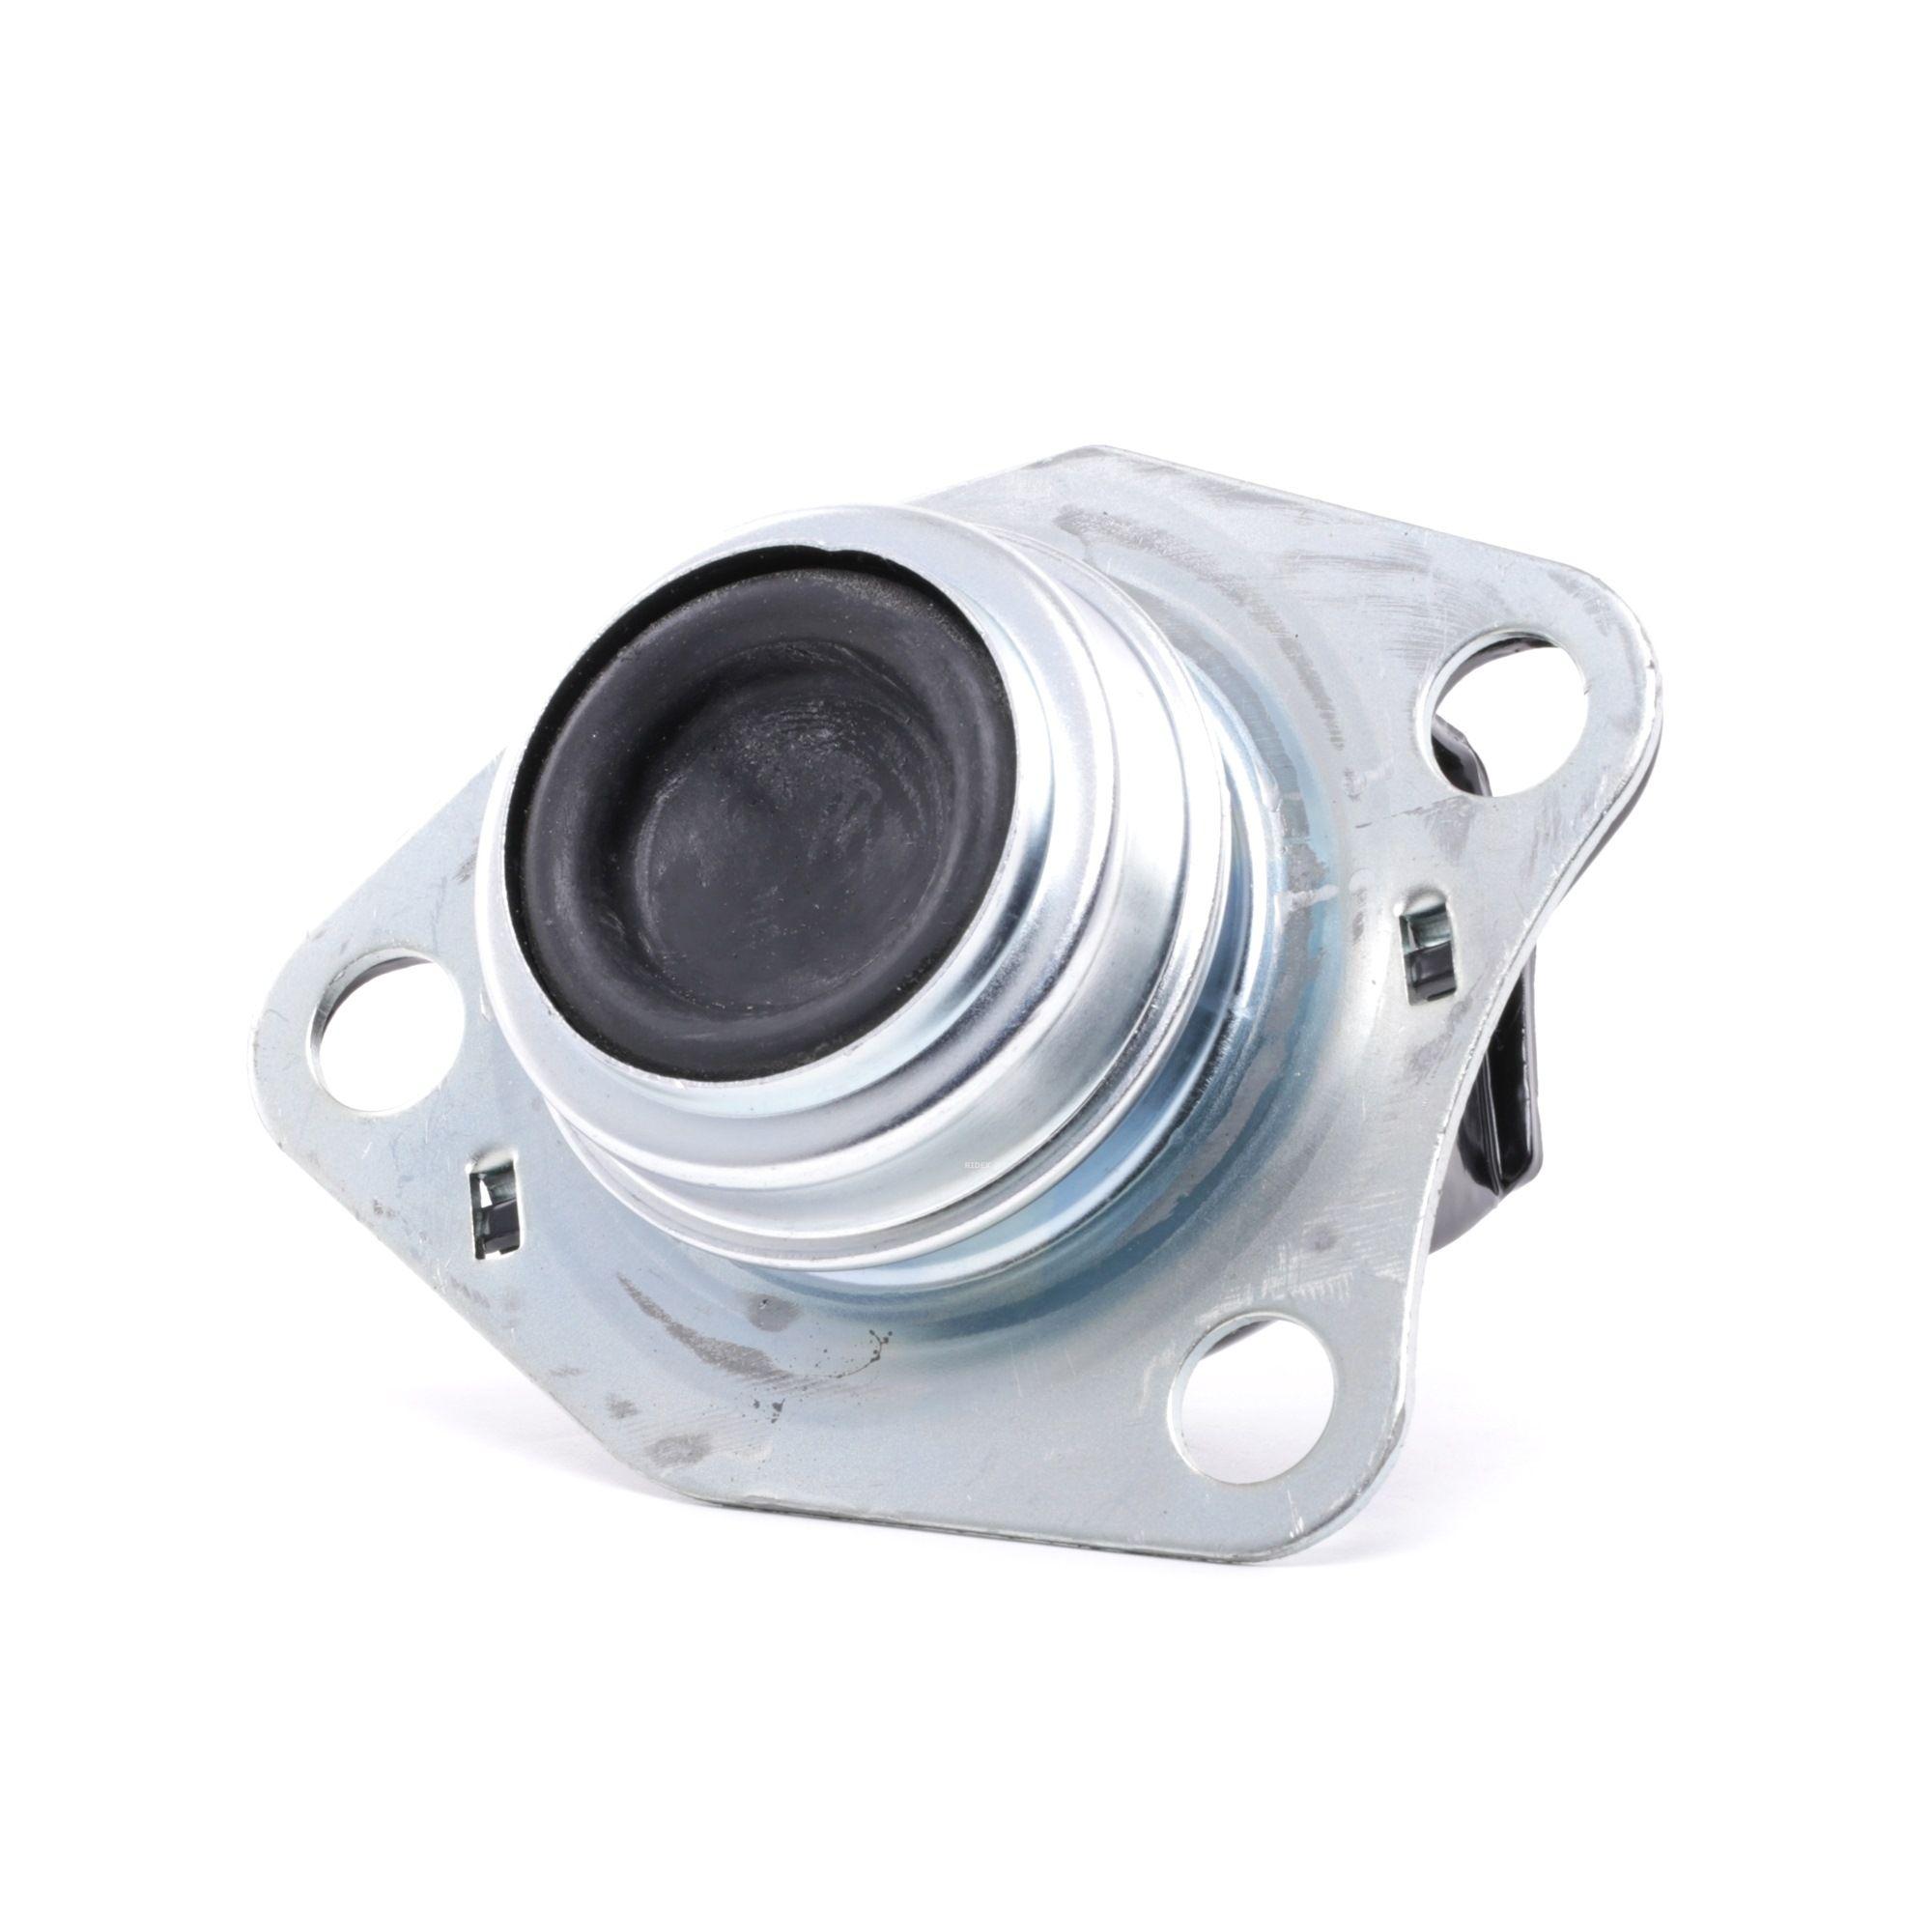 RIDEX: Original Motoraufhängung 247E0017 (Material: Gummi/Metall)